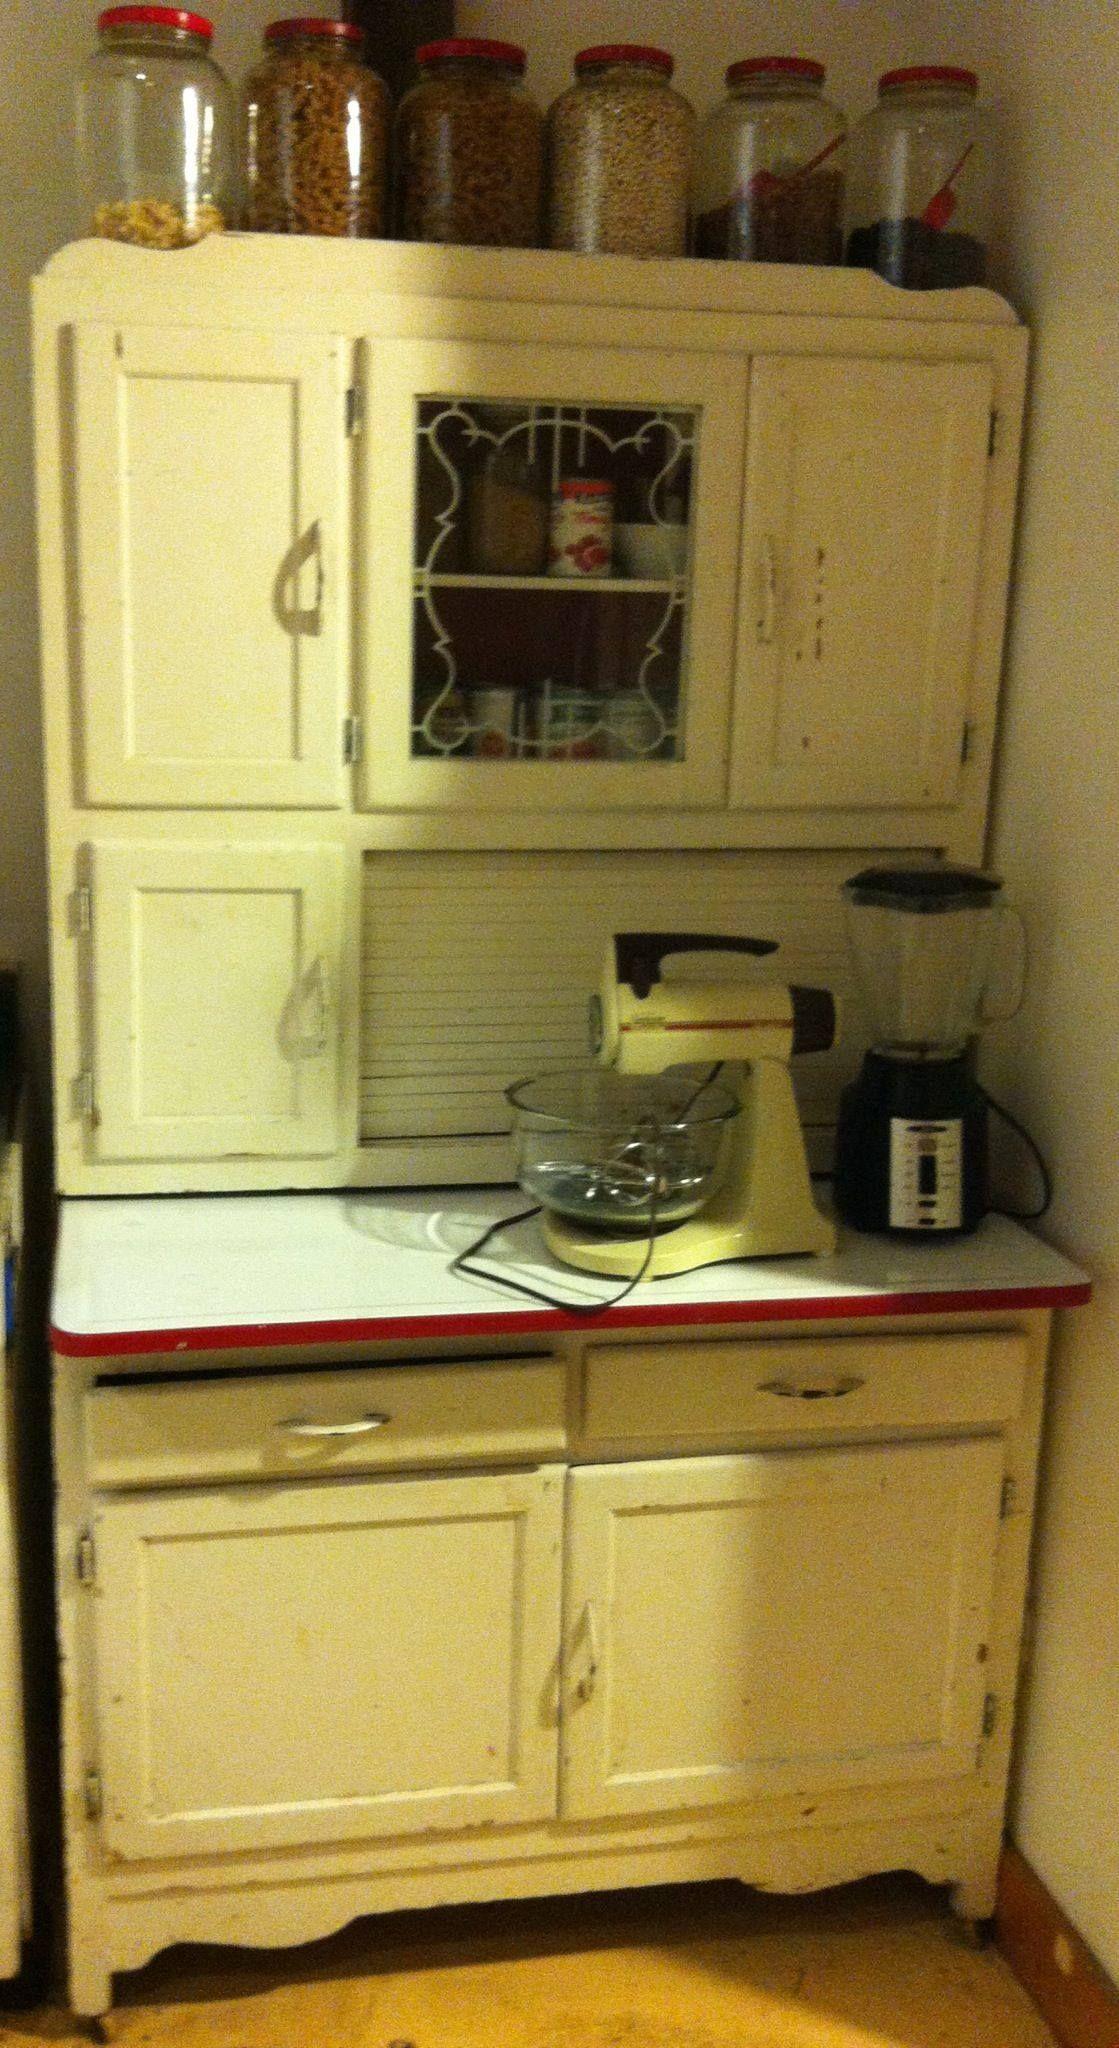 Best Kitchen Gallery: My Hoosier Cabi It Originally Belonged To My Great Grandmother of Vintage Kitchen Cupboards on rachelxblog.com